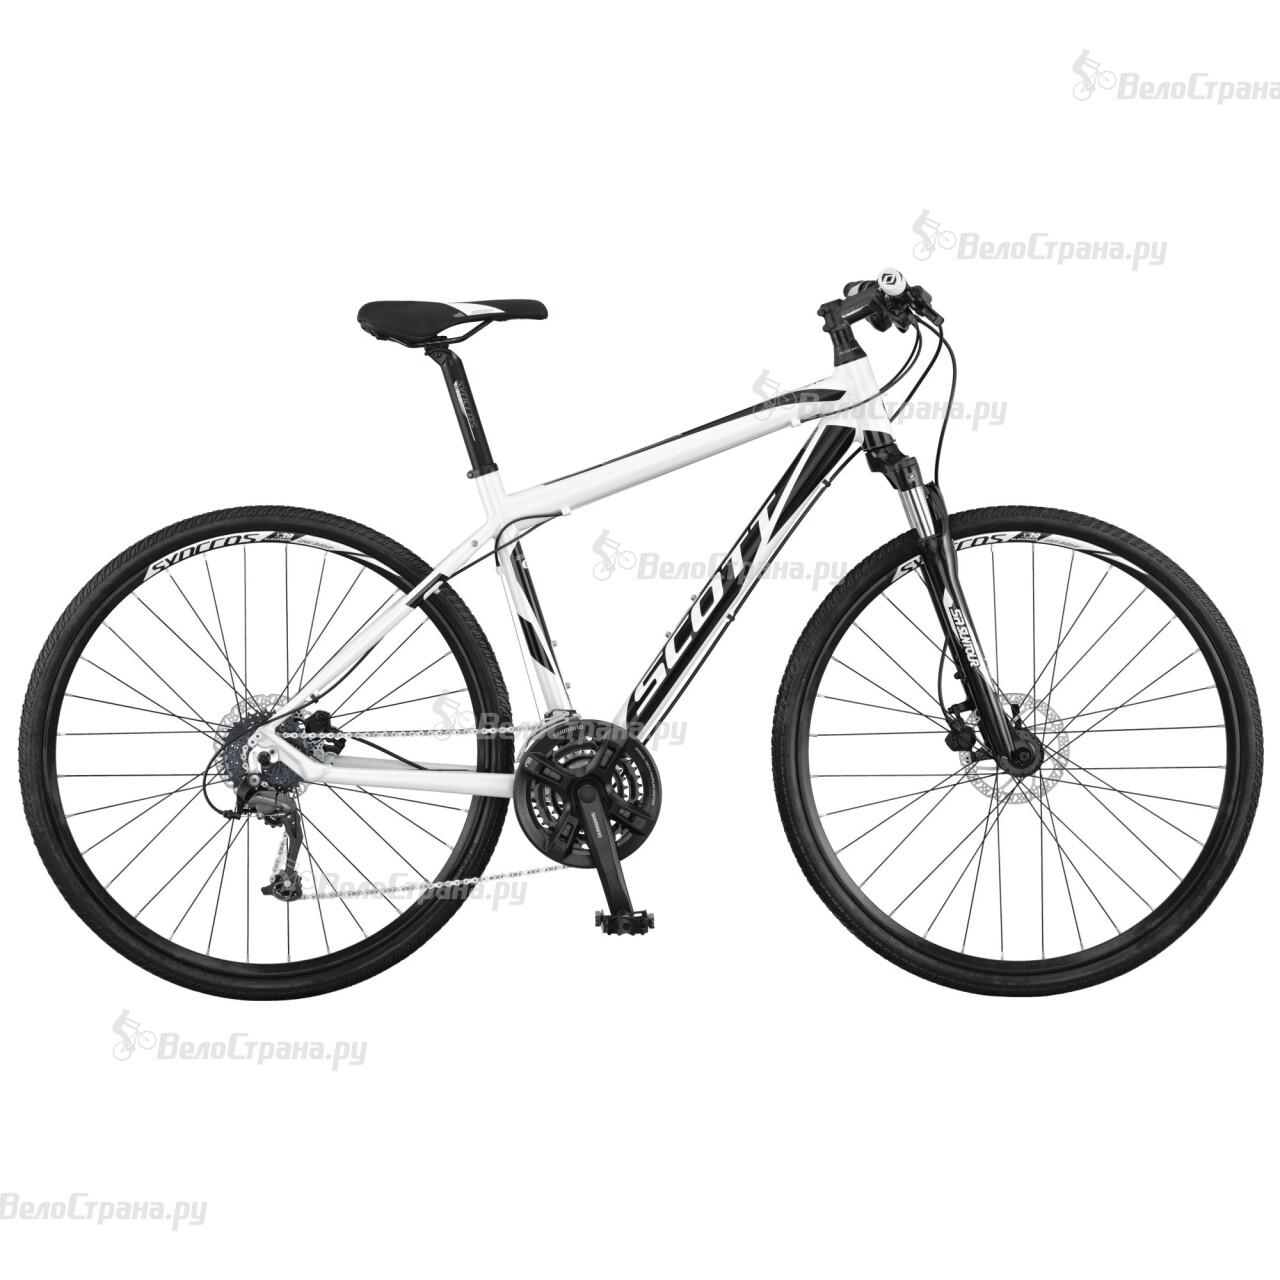 Велосипед Scott Sportster 50 MEN (2015) motorcycle chrome front spoiler chin fairing for harley sportster xl883 1200 04 15 new